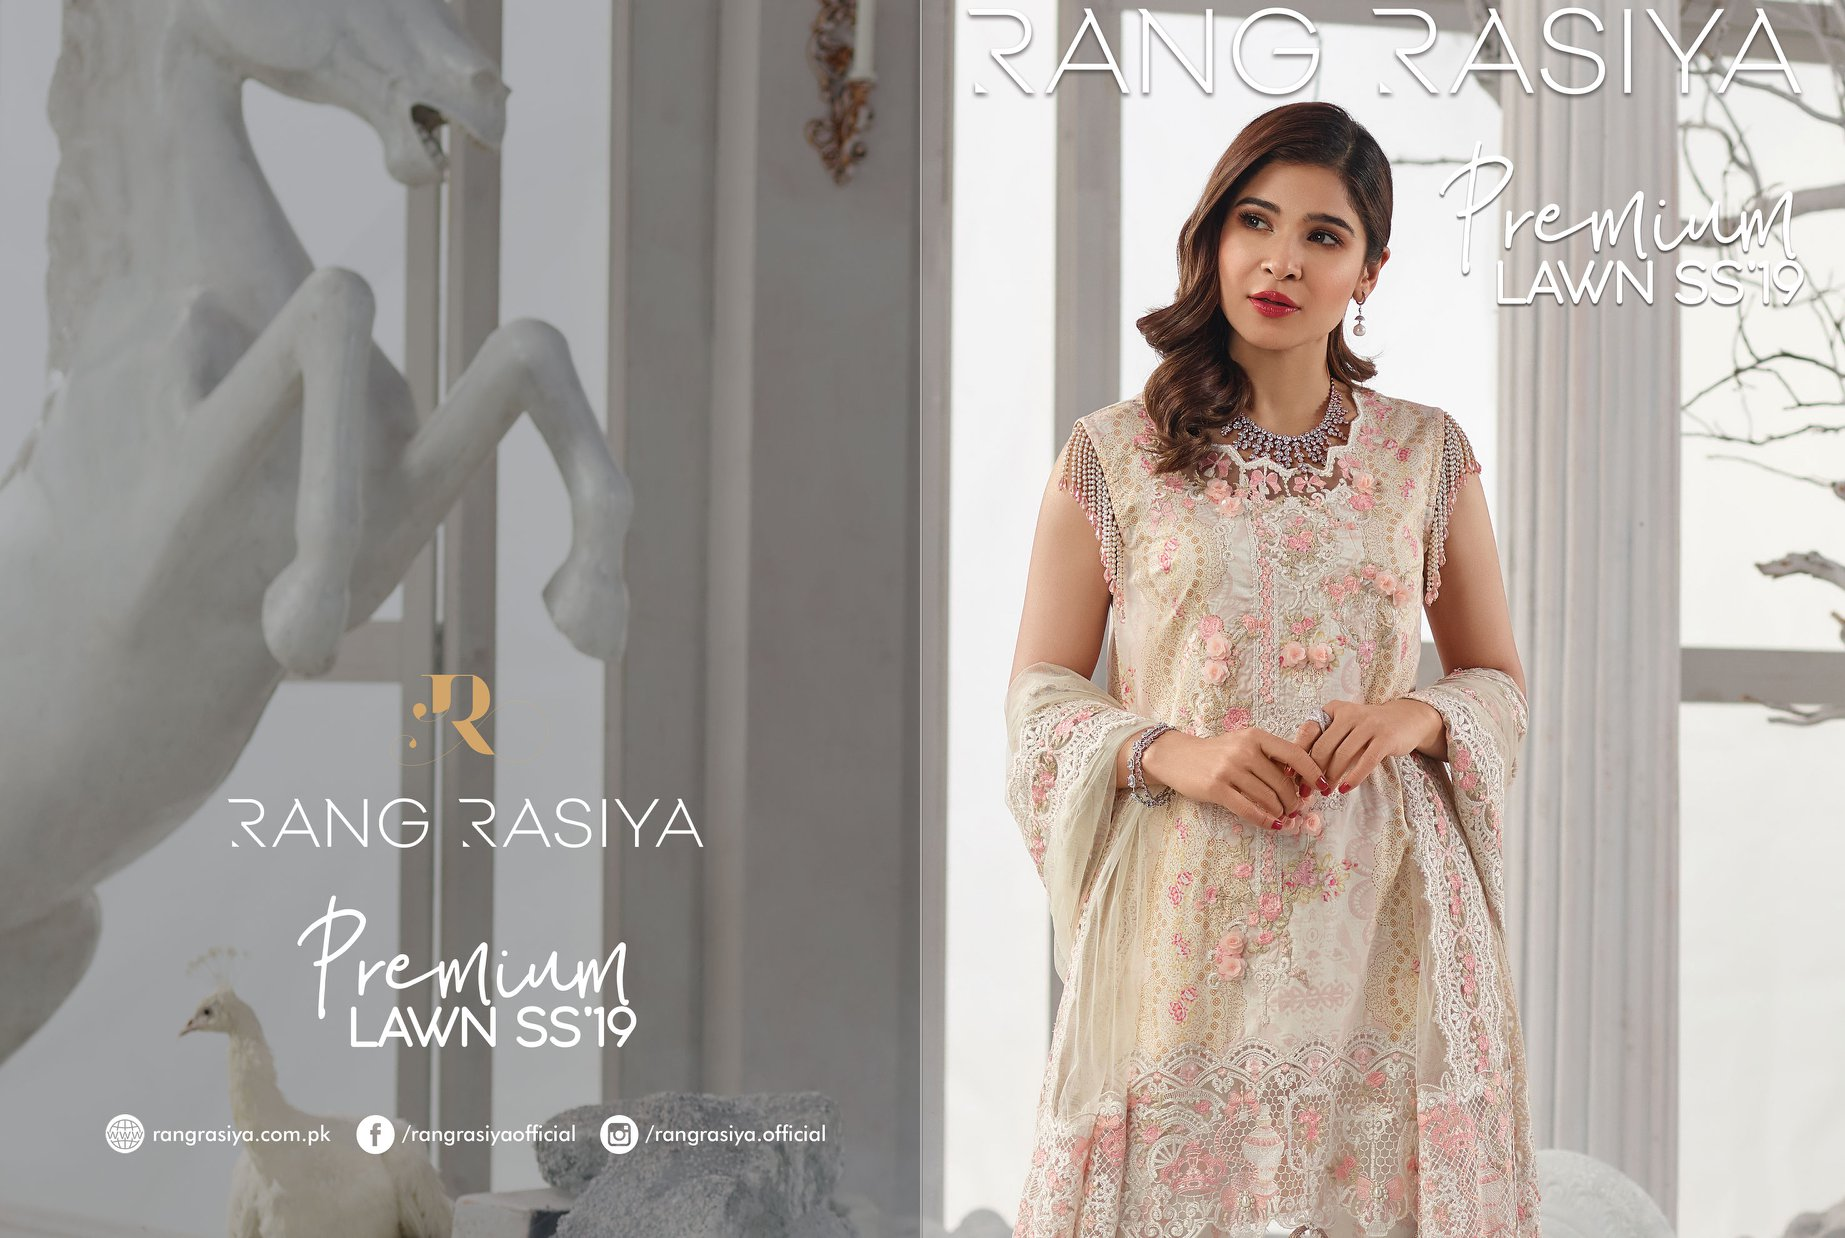 Rang Rasiya Premium Lawn 2019